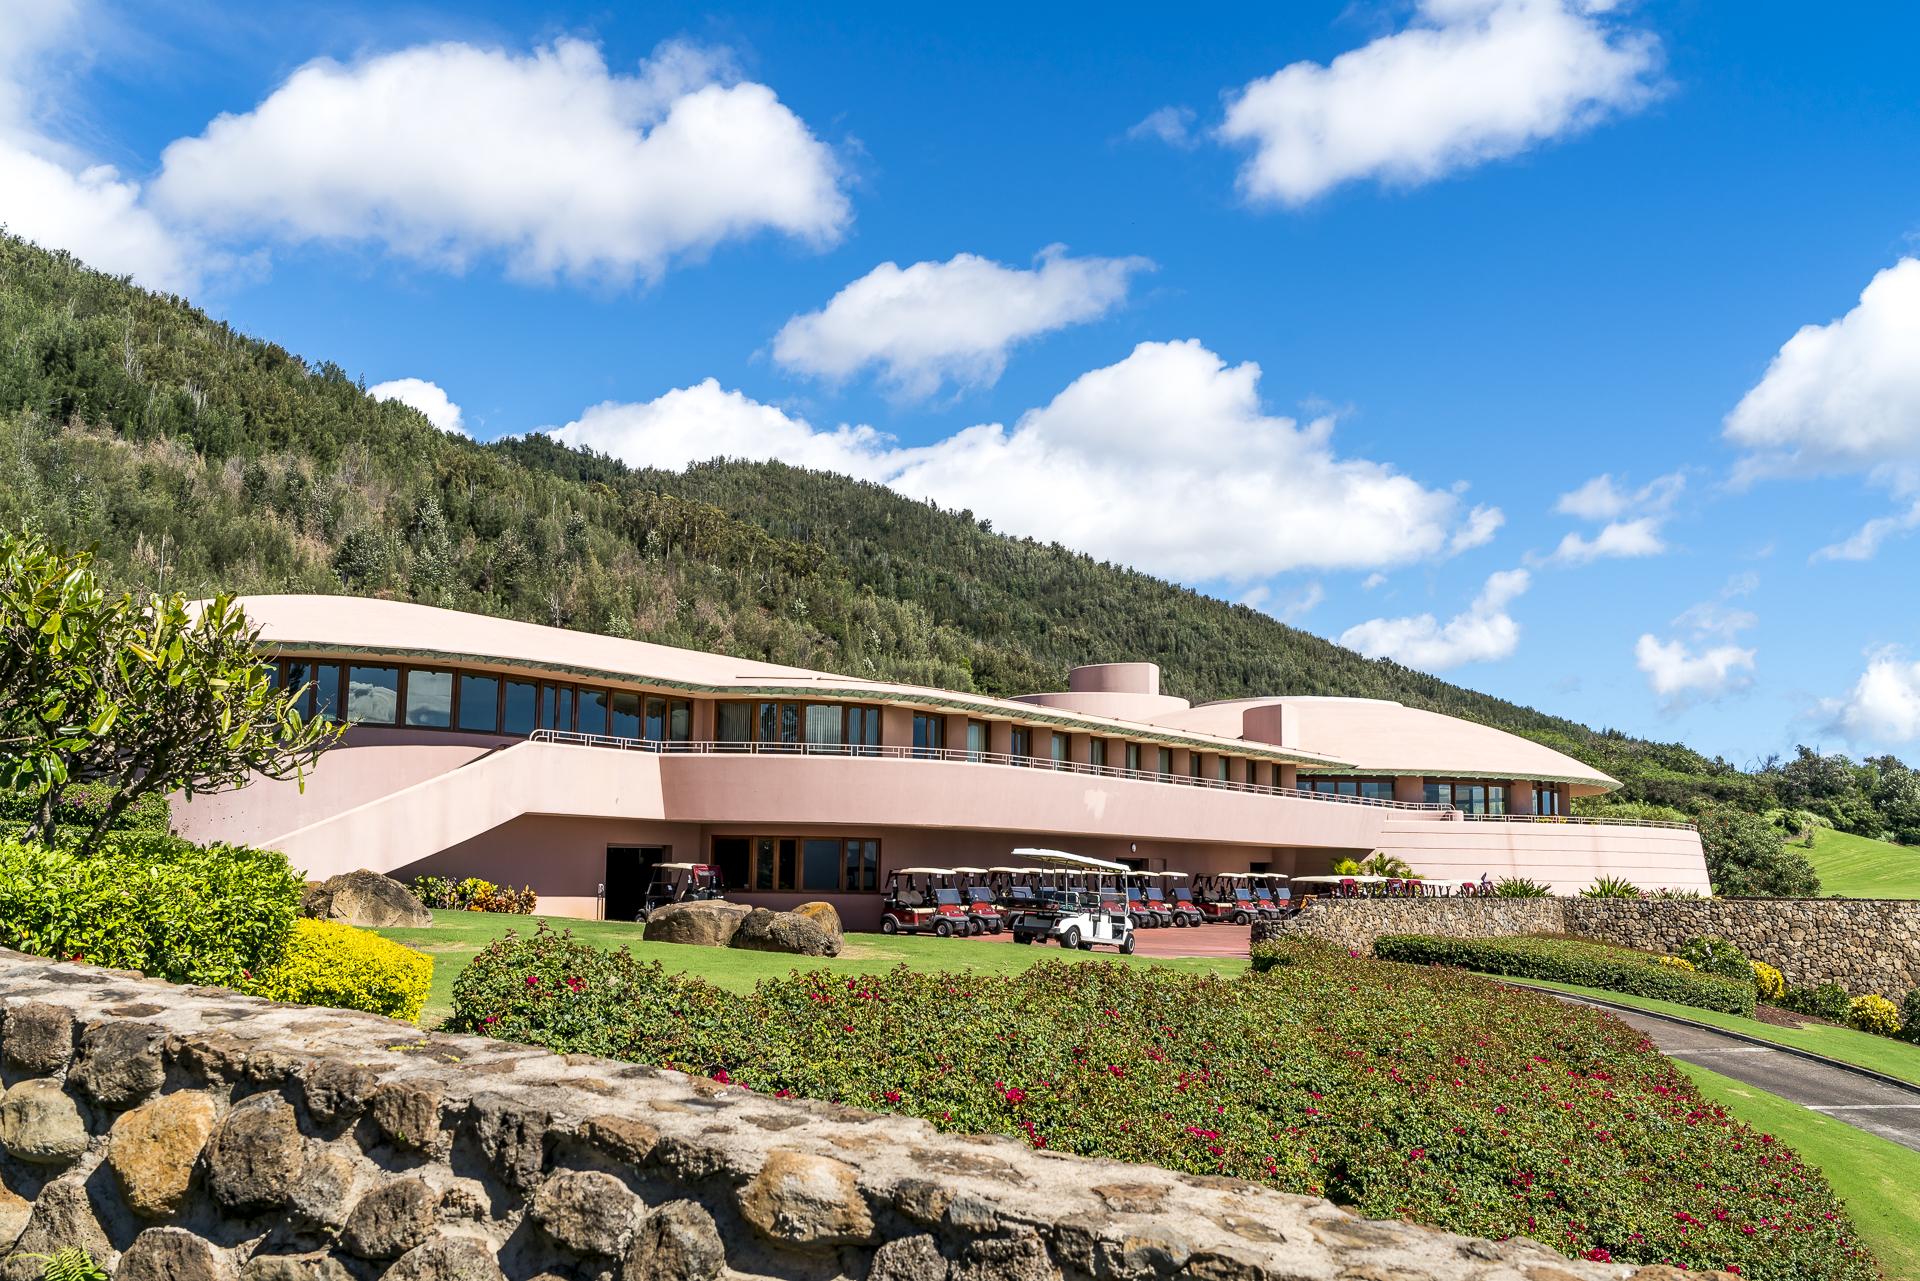 The King Kamehameha Golfclub Maui